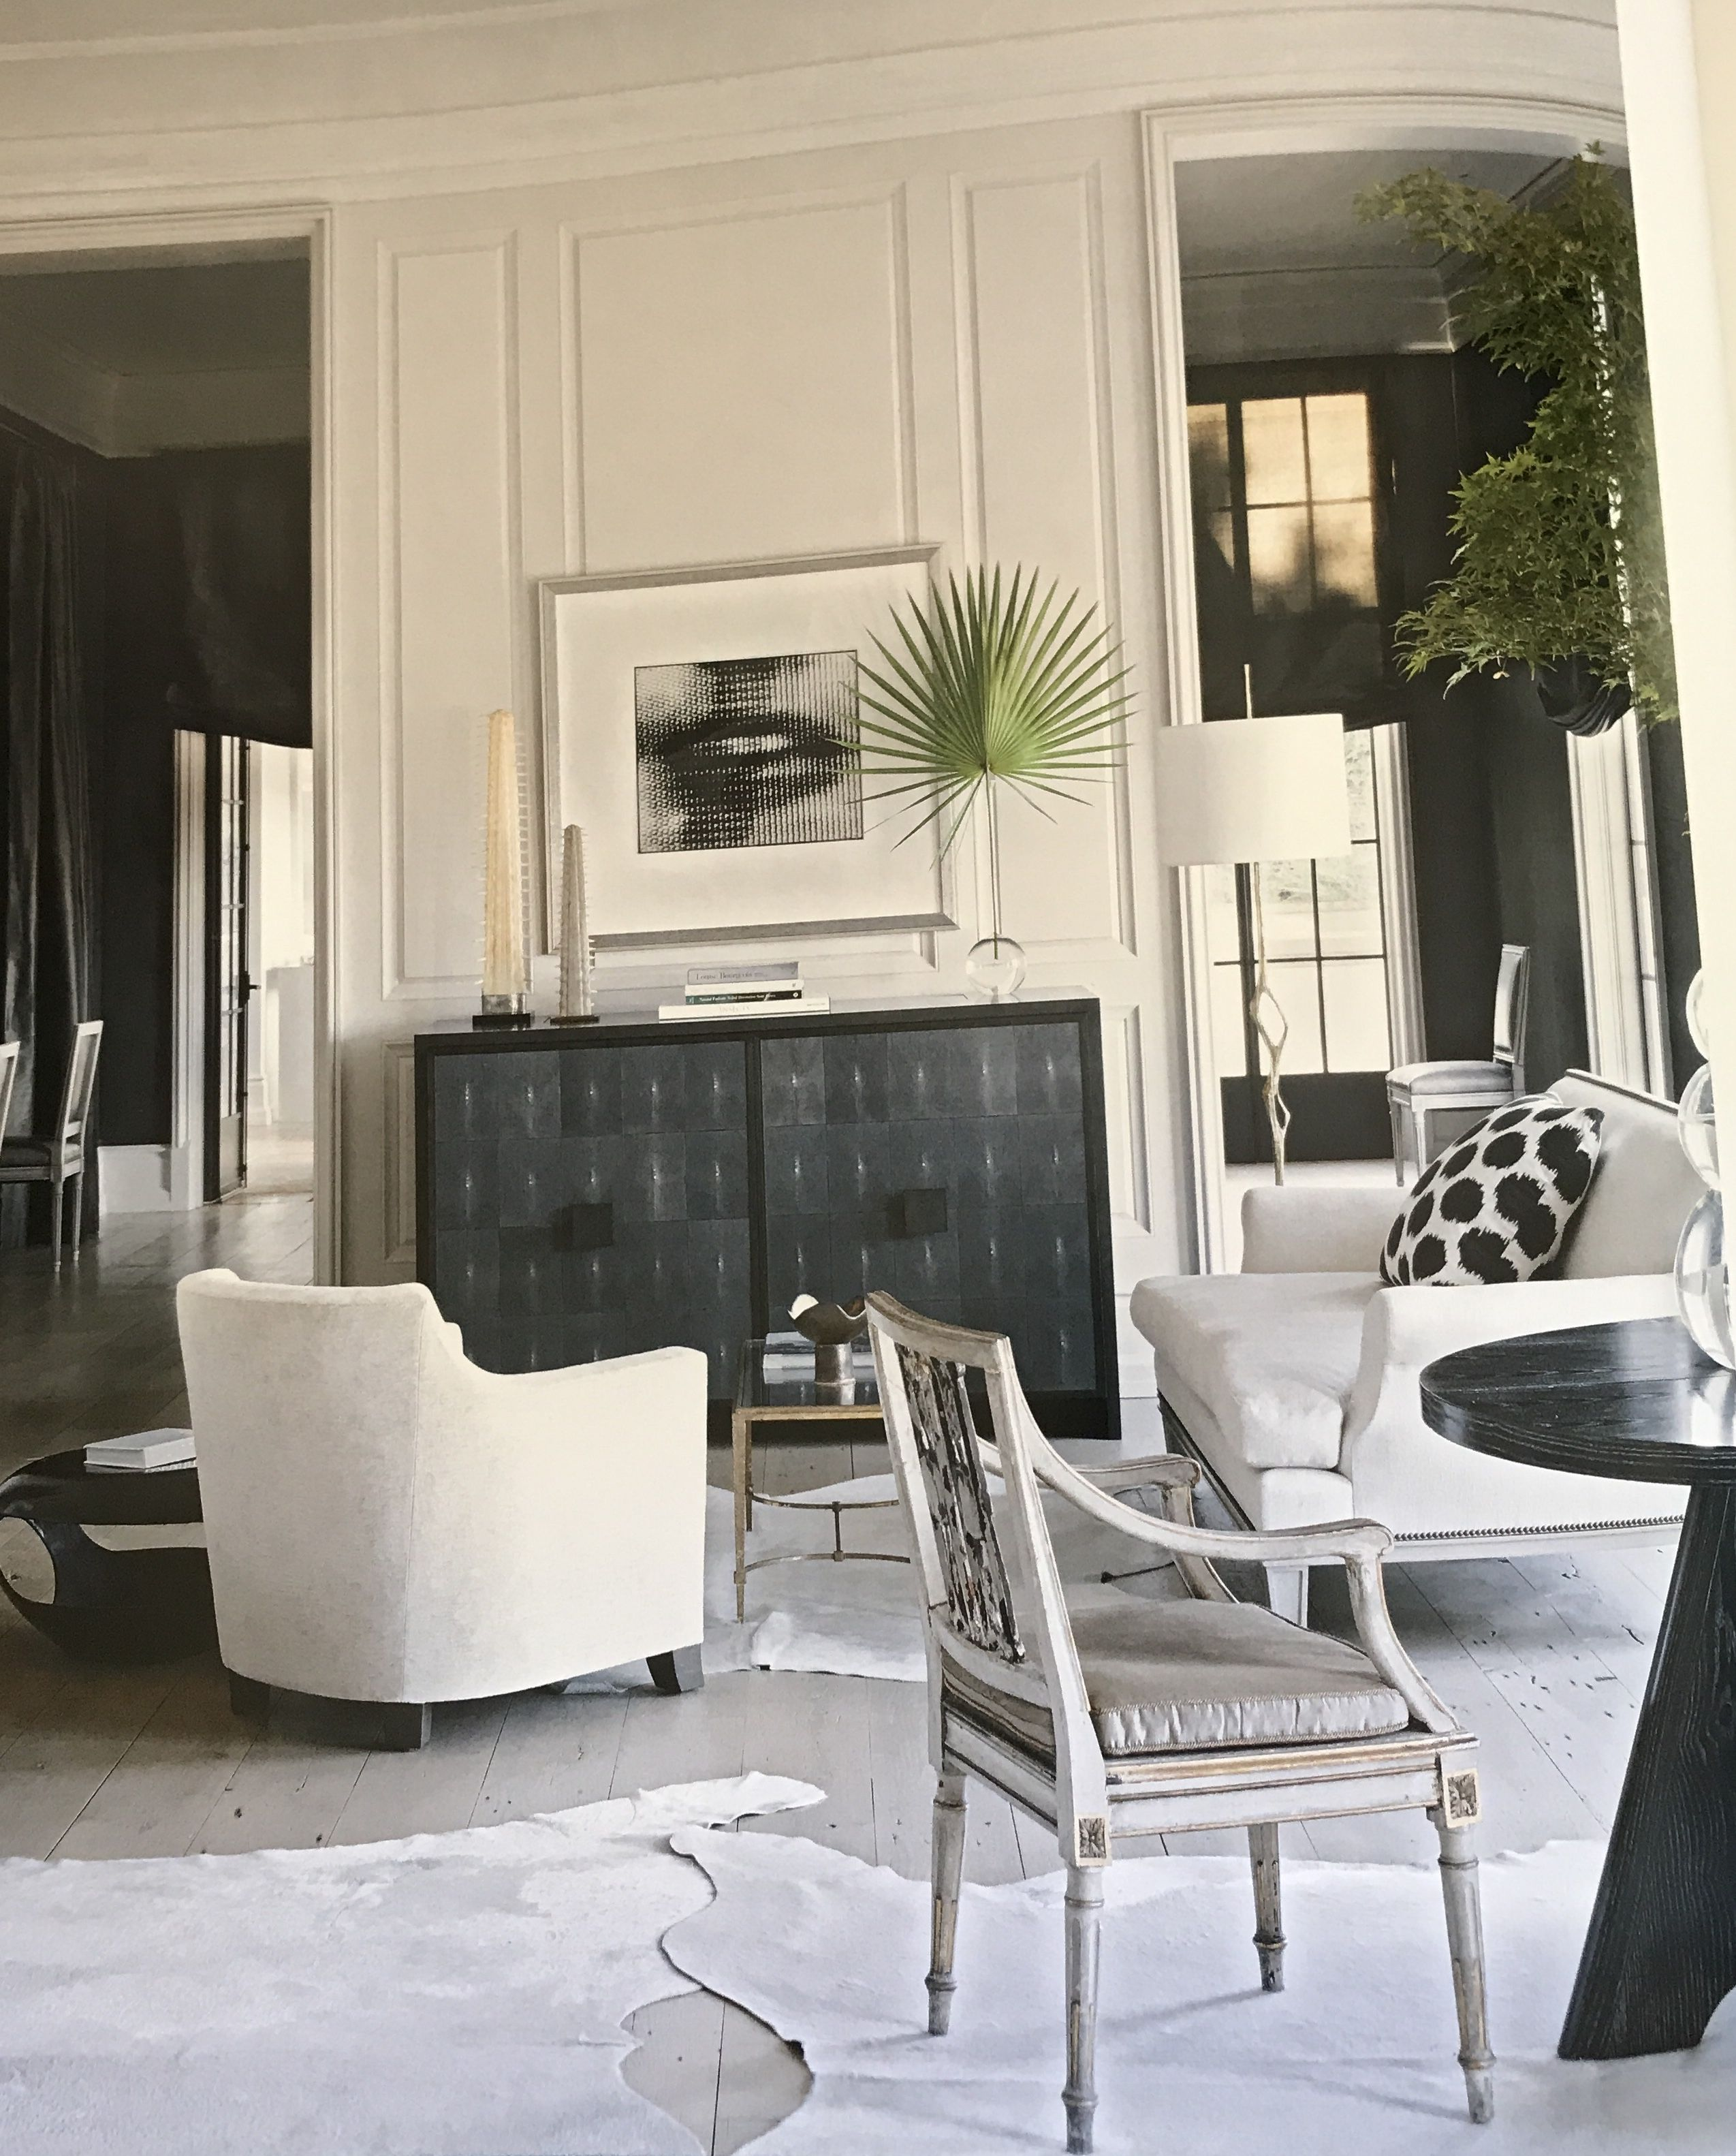 Living Room Concept: Light Floors, Dark Contrasting